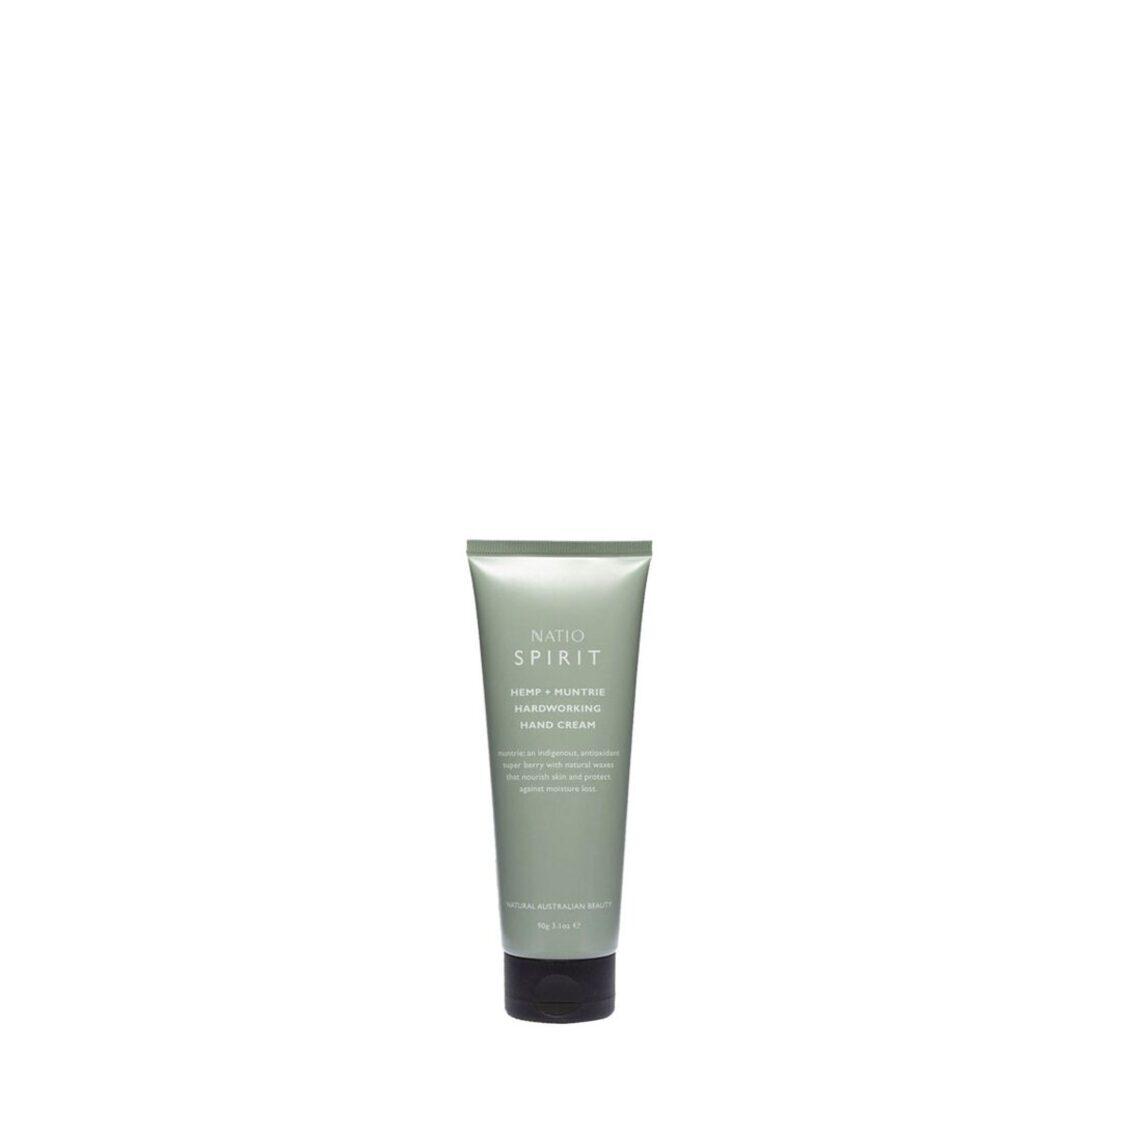 Natio Spirit Hemp  Muntrie Hardworking Hand Cream 90g